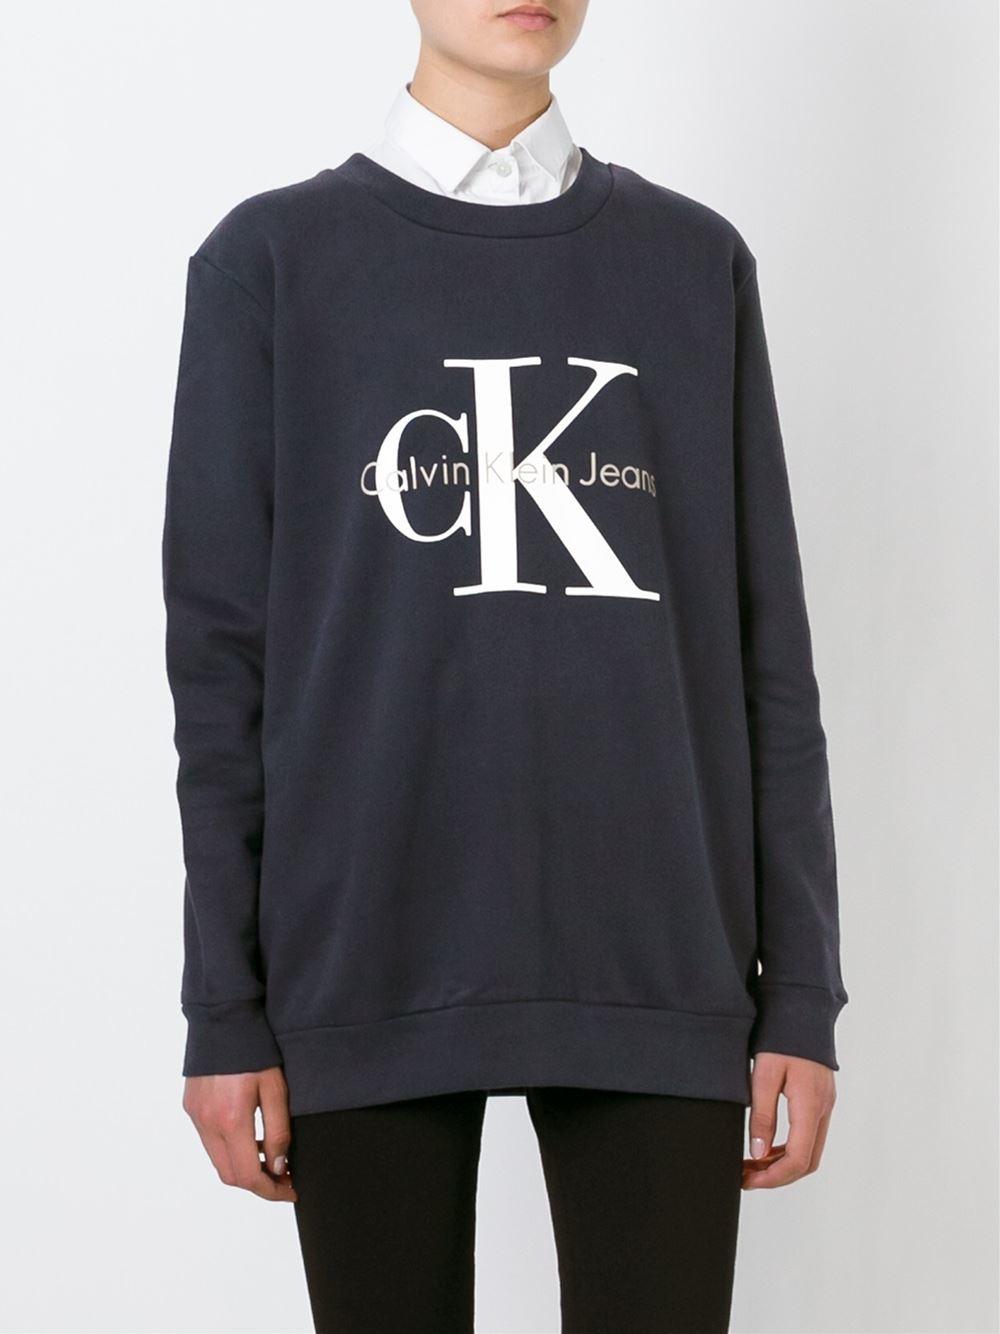 calvin klein jeans logo print sweatshirt in blue lyst. Black Bedroom Furniture Sets. Home Design Ideas